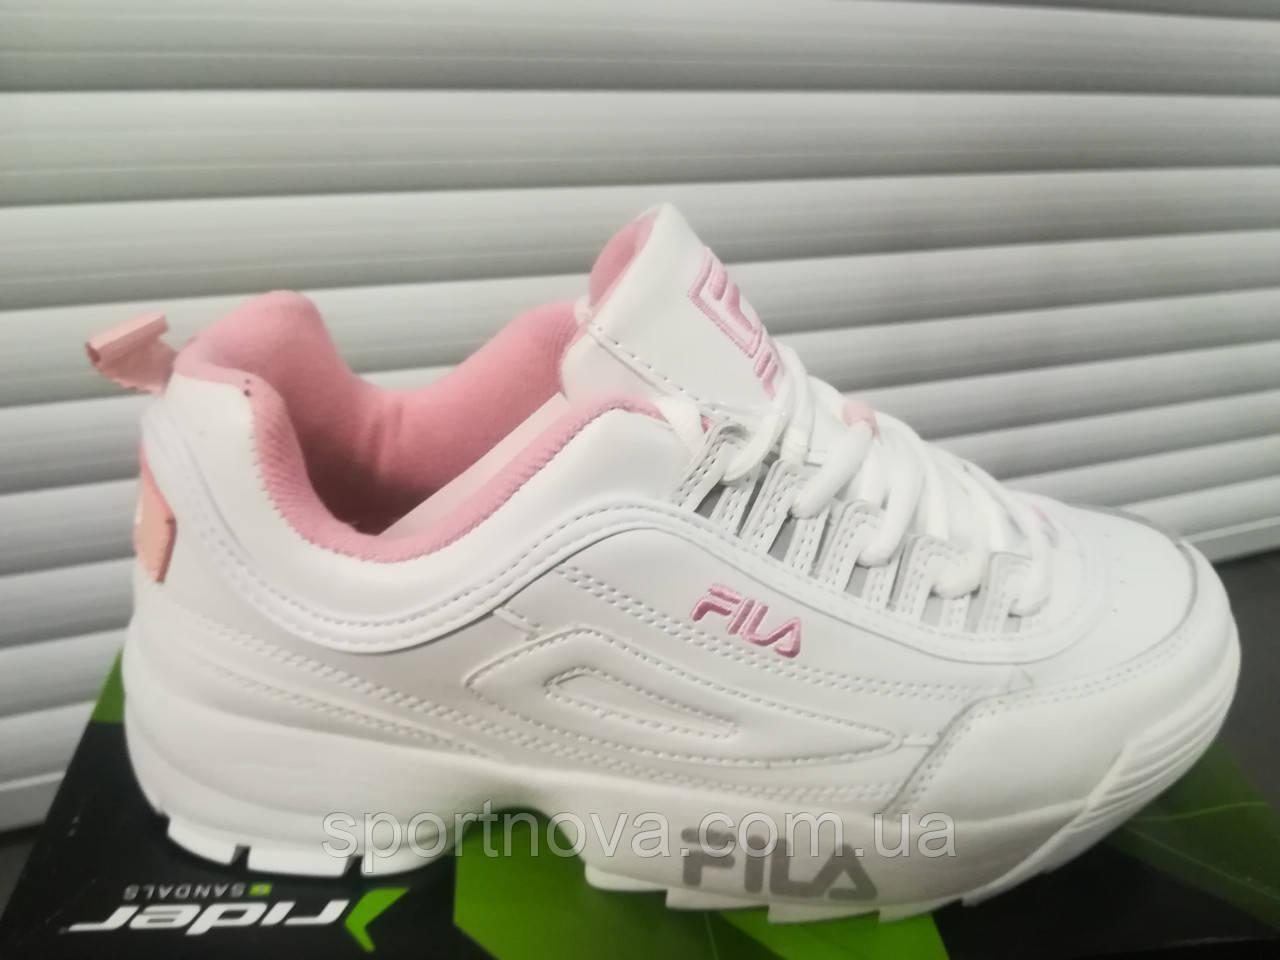 abc02e4214f3 Кроссовки Fila Disruptor 2 White pink (реплика) - Интернет-магазин  спортивной обуви